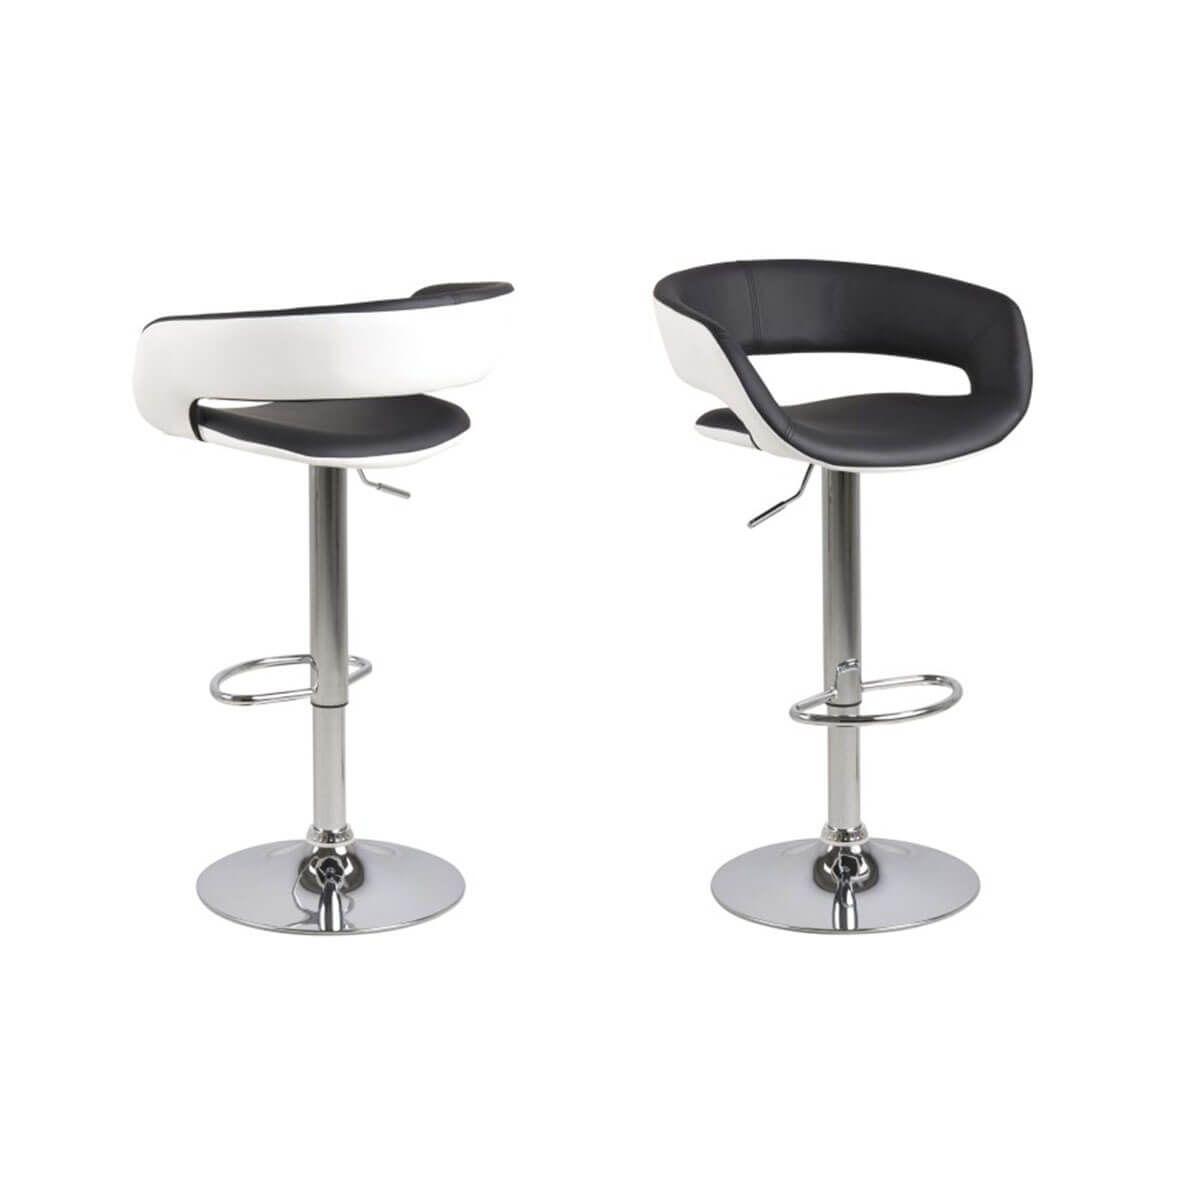 Sgabelli da bar design set di 2 nero e bianco eco pelle GRAVIT V2 Sgabelli da bar